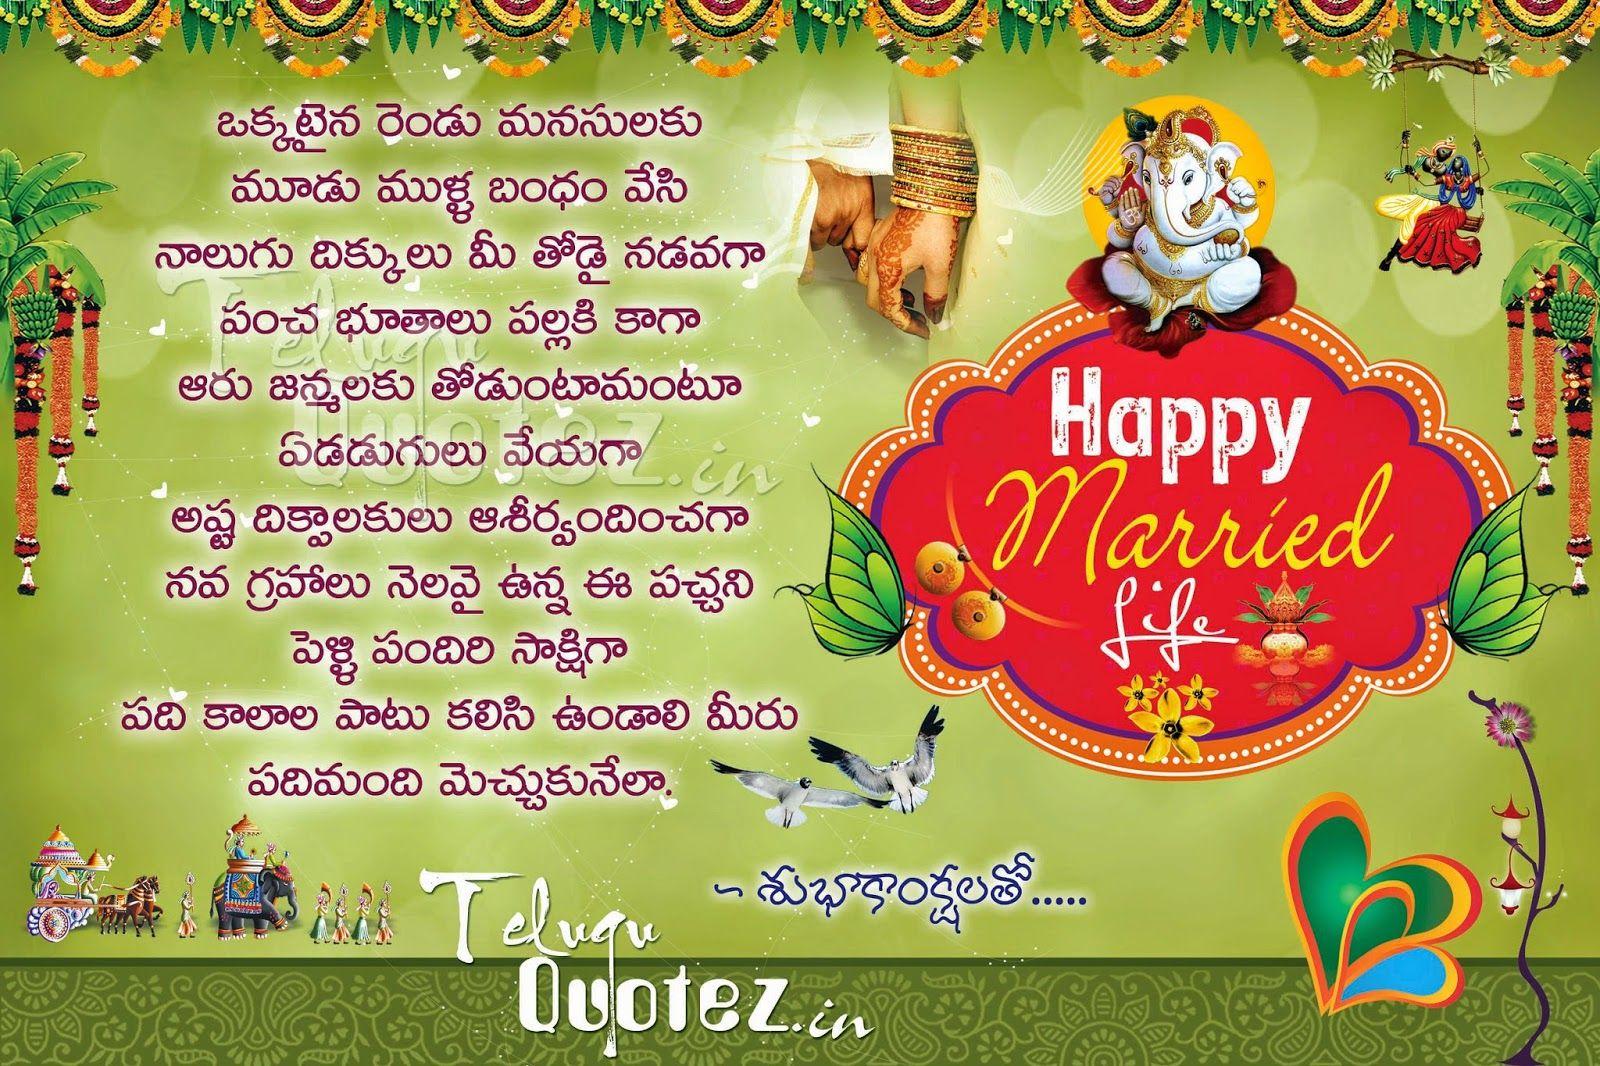 Indian Wedding Telugu Wishes For Couples